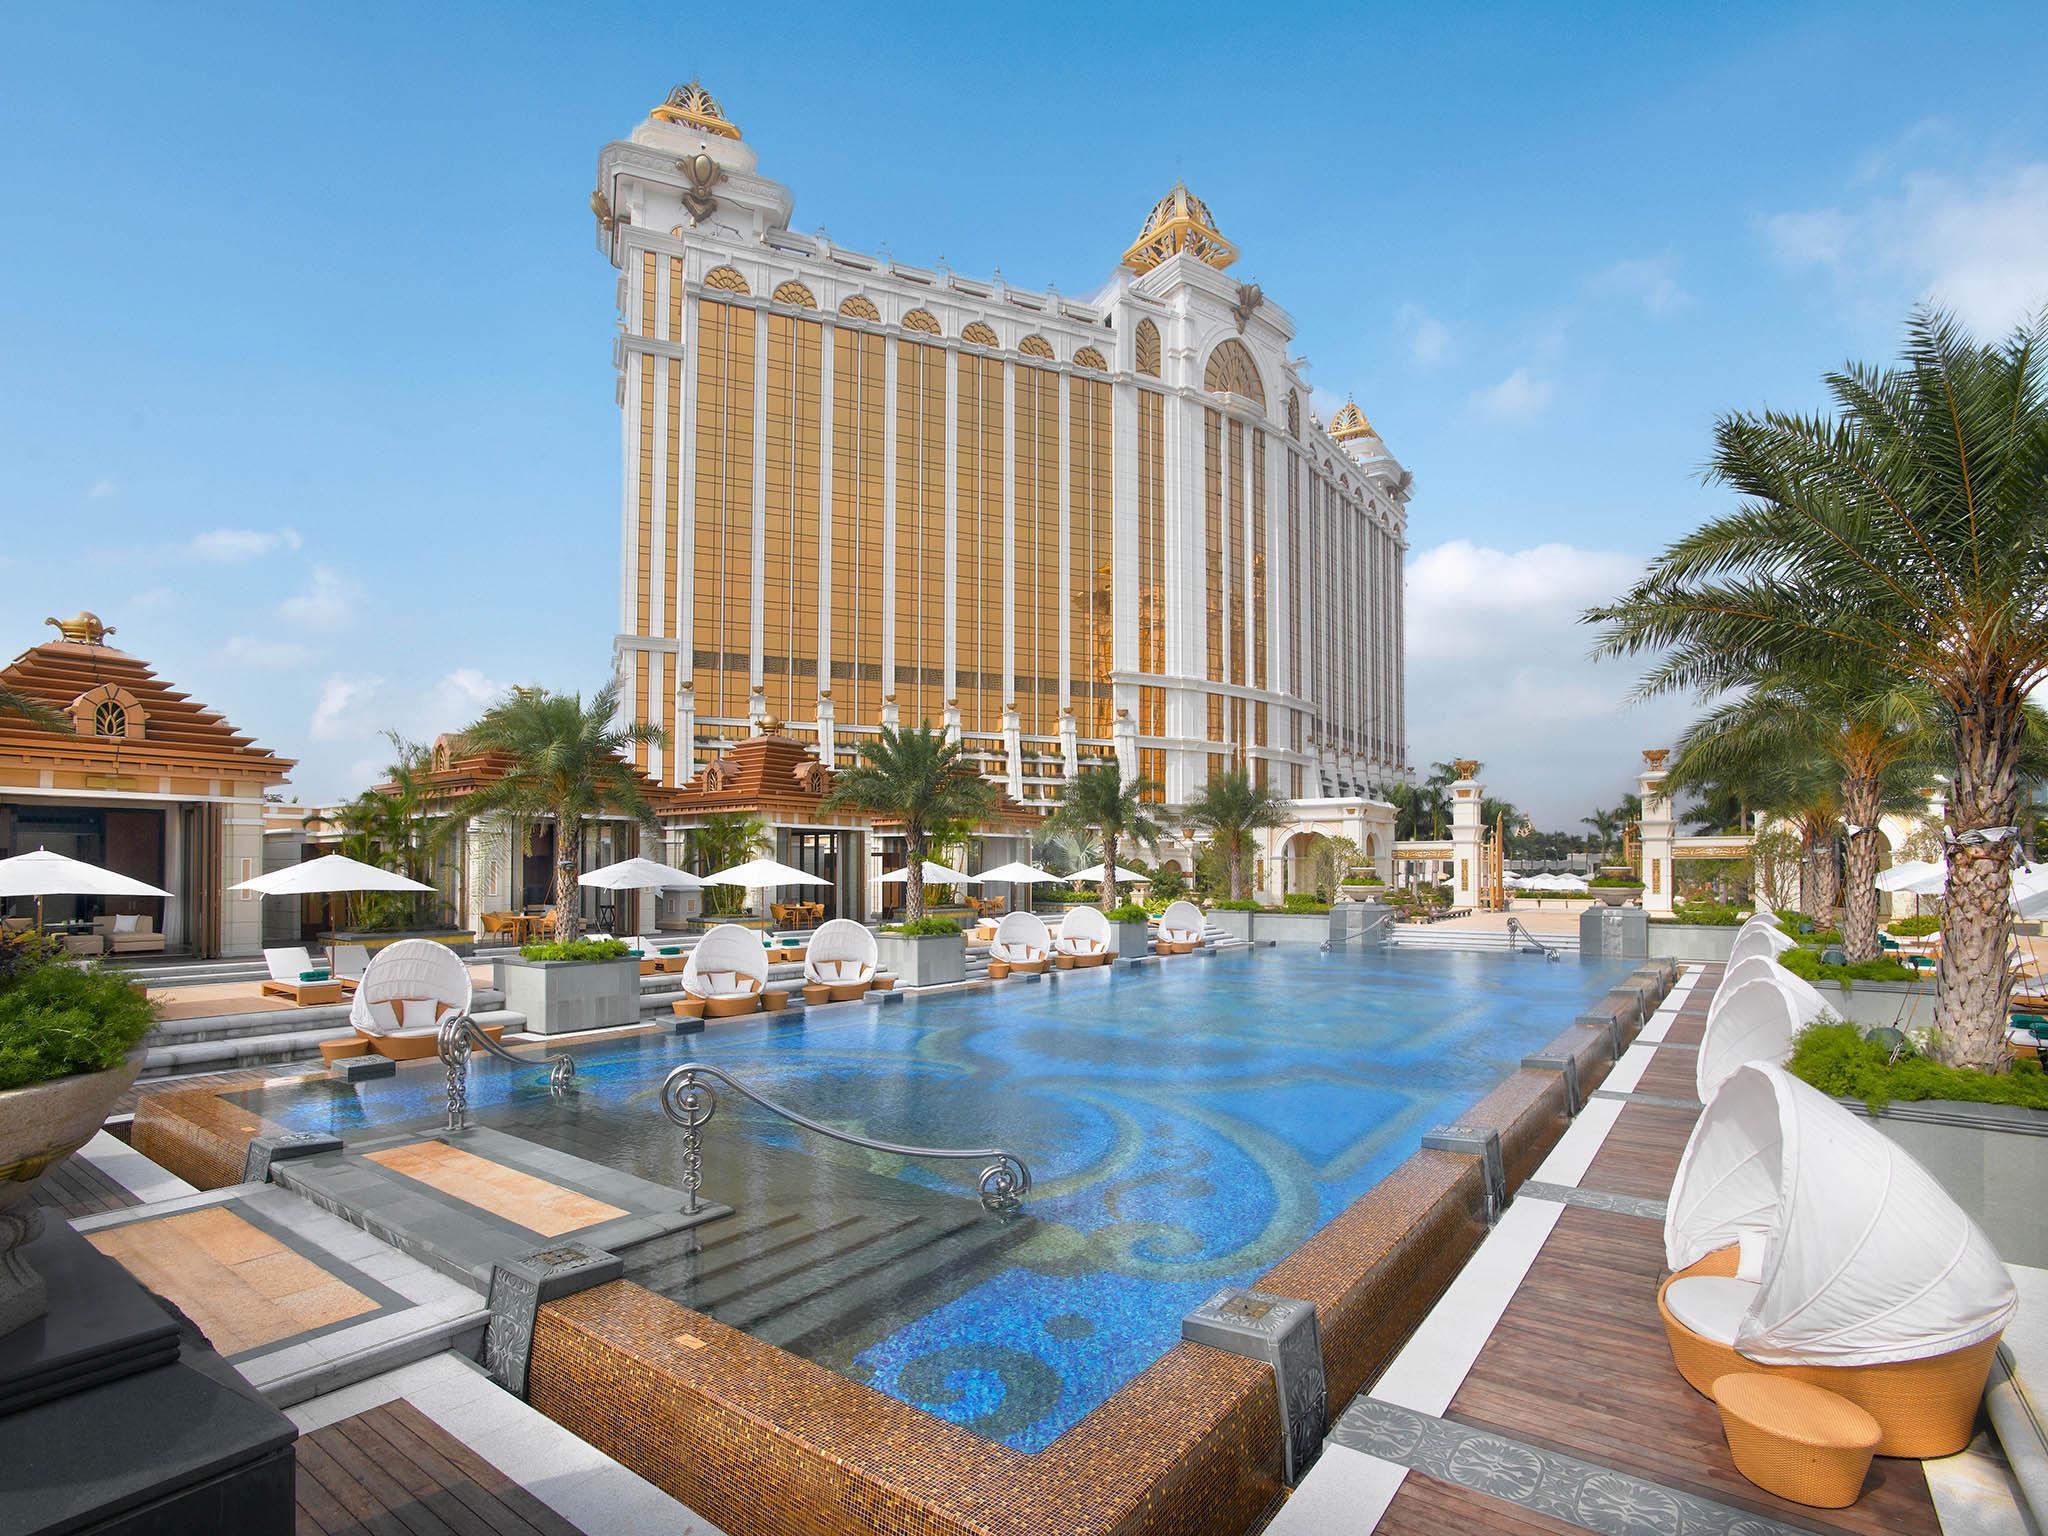 Hotel – Banyan Tree Macau